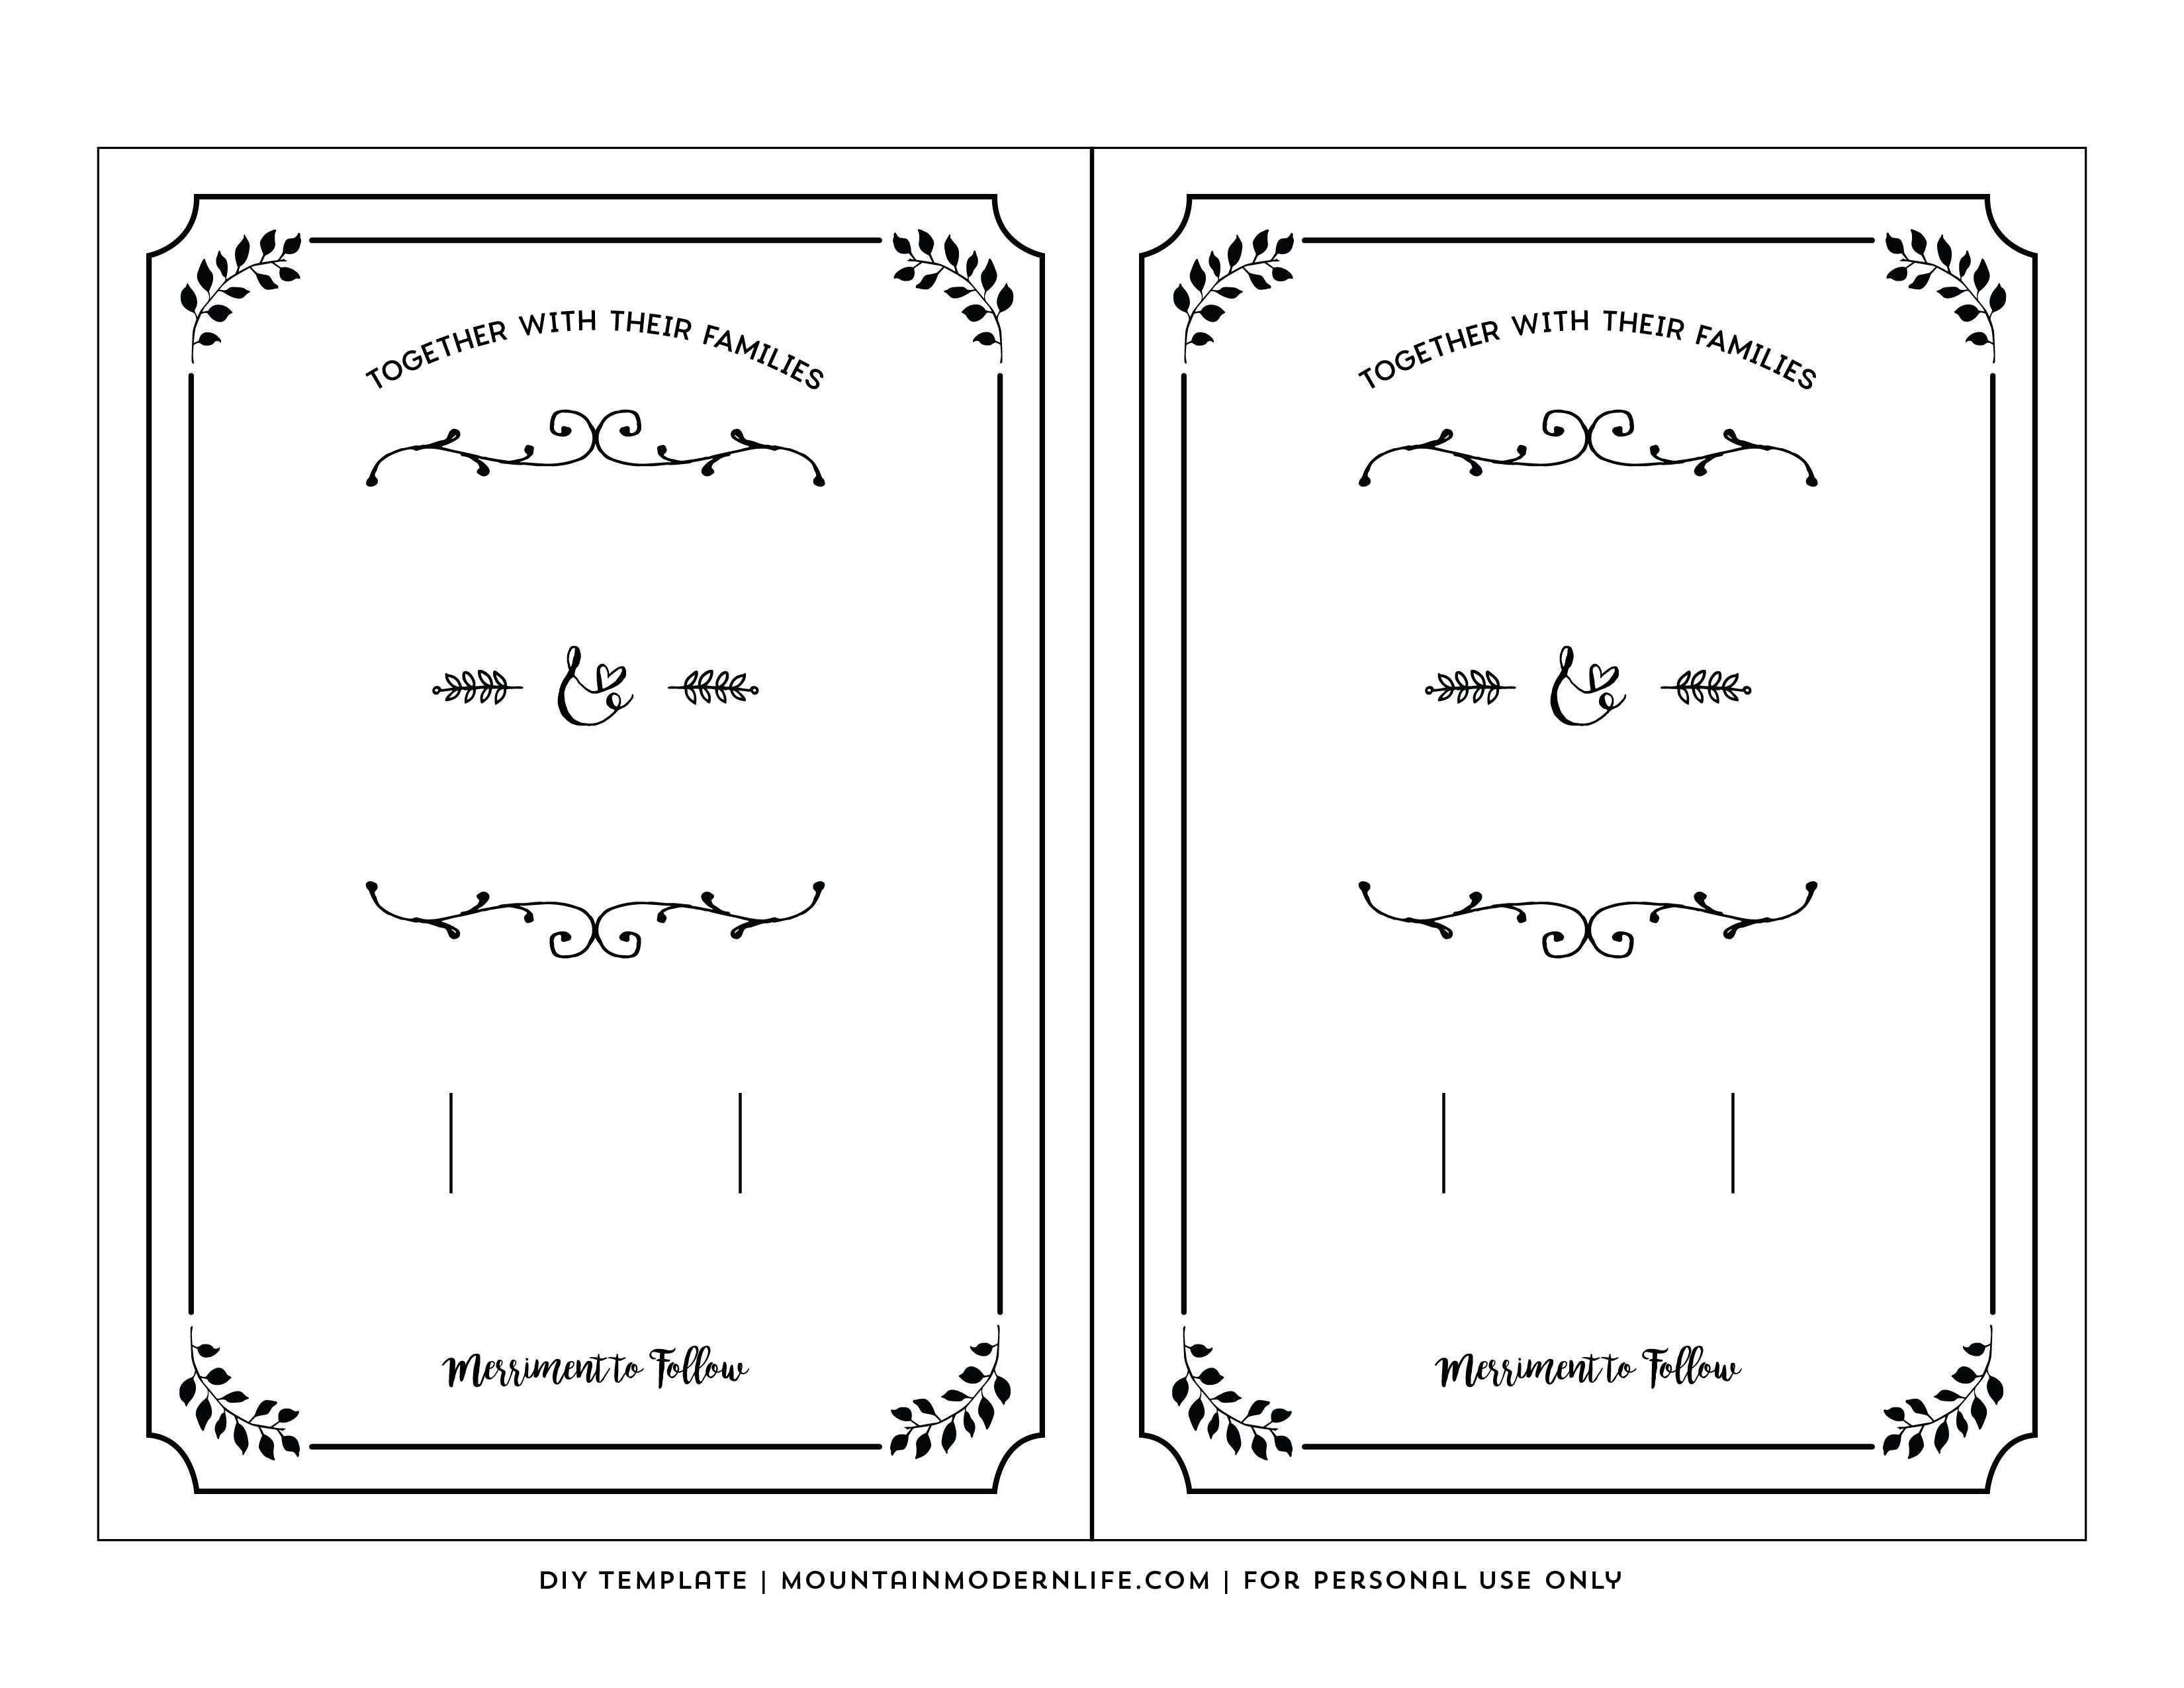 003 Stirring Invitation Template Free Printable Concept  Editable Christma Party Dinner RetirementFull